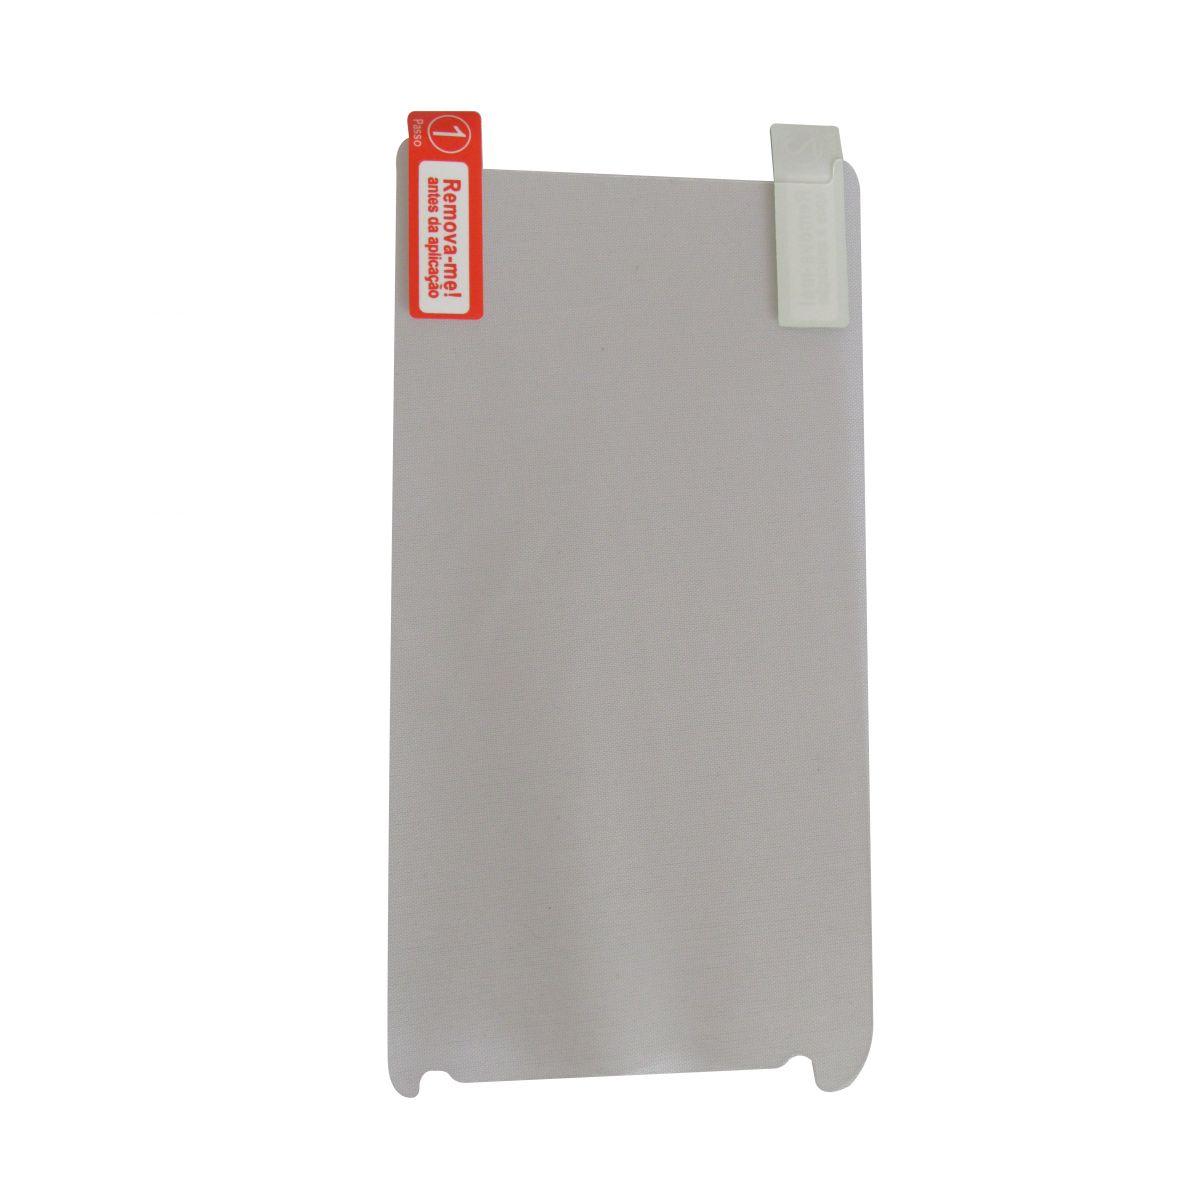 Película Protetora para Motorola Moto X2 XT1096 - Transparente